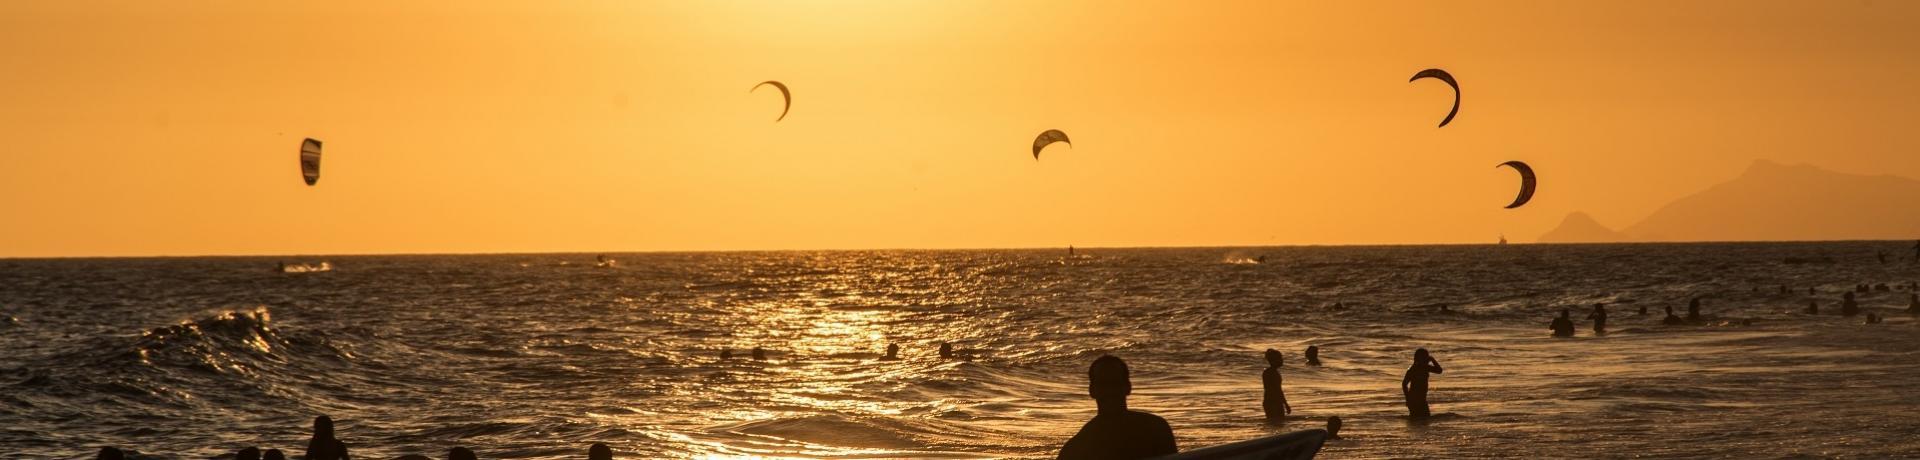 Emotion: Kiter und Kites am Strand